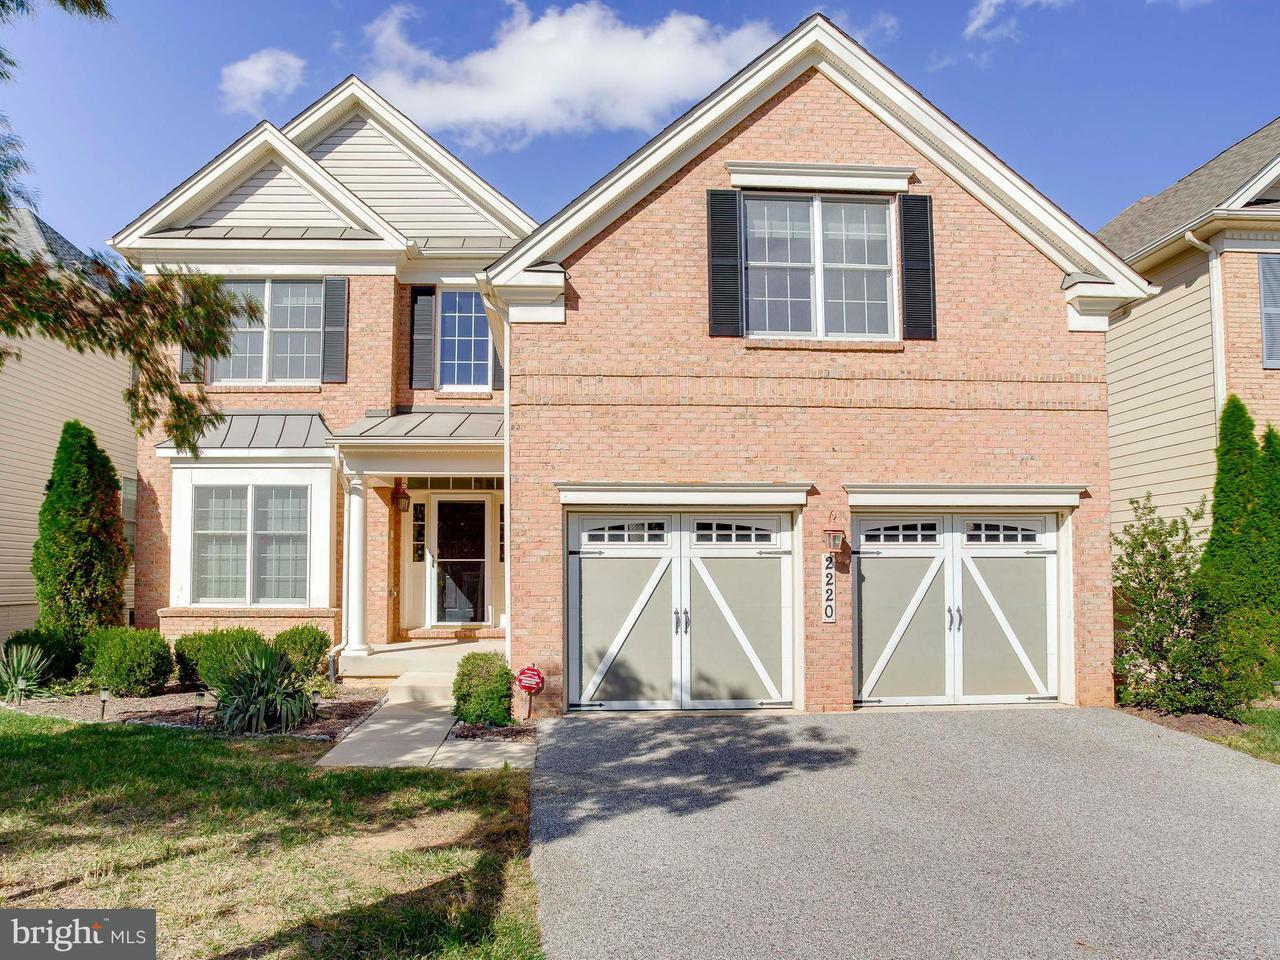 Single Family Home for Sale at 2220 HOLLOWOAK Drive 2220 HOLLOWOAK Drive Hanover, Maryland 21076 United States